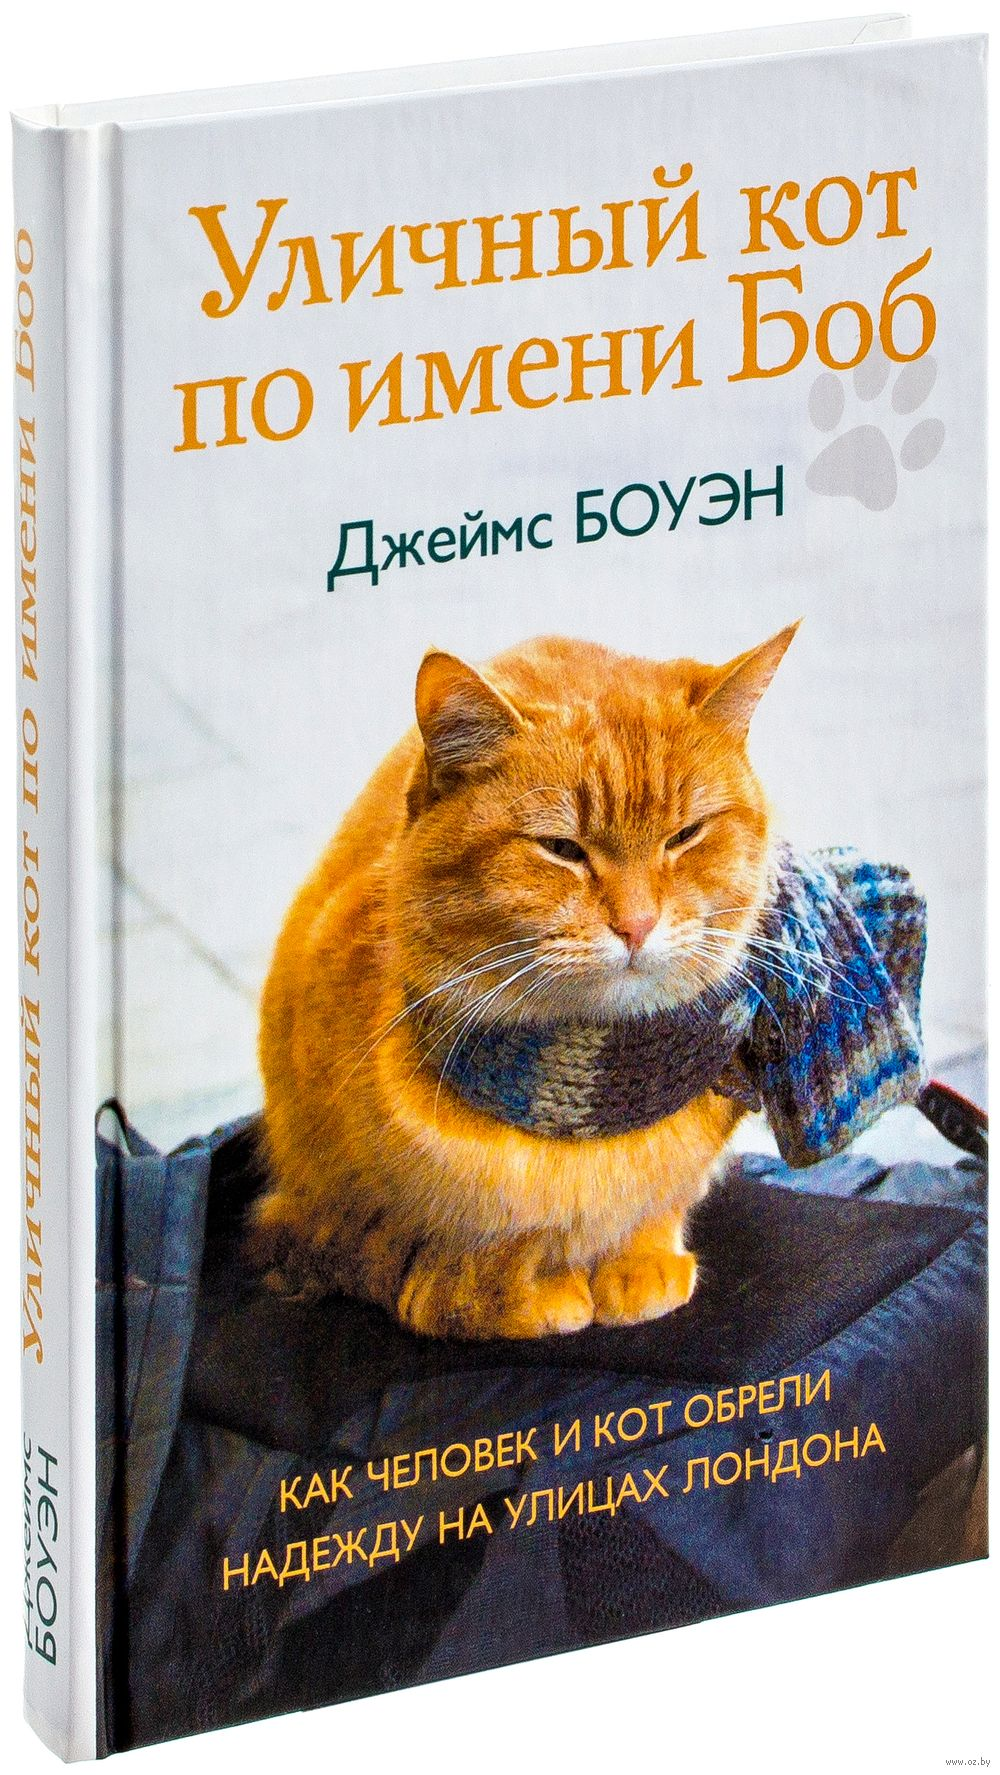 Уличный кот по имени боб.джеймс боуэн